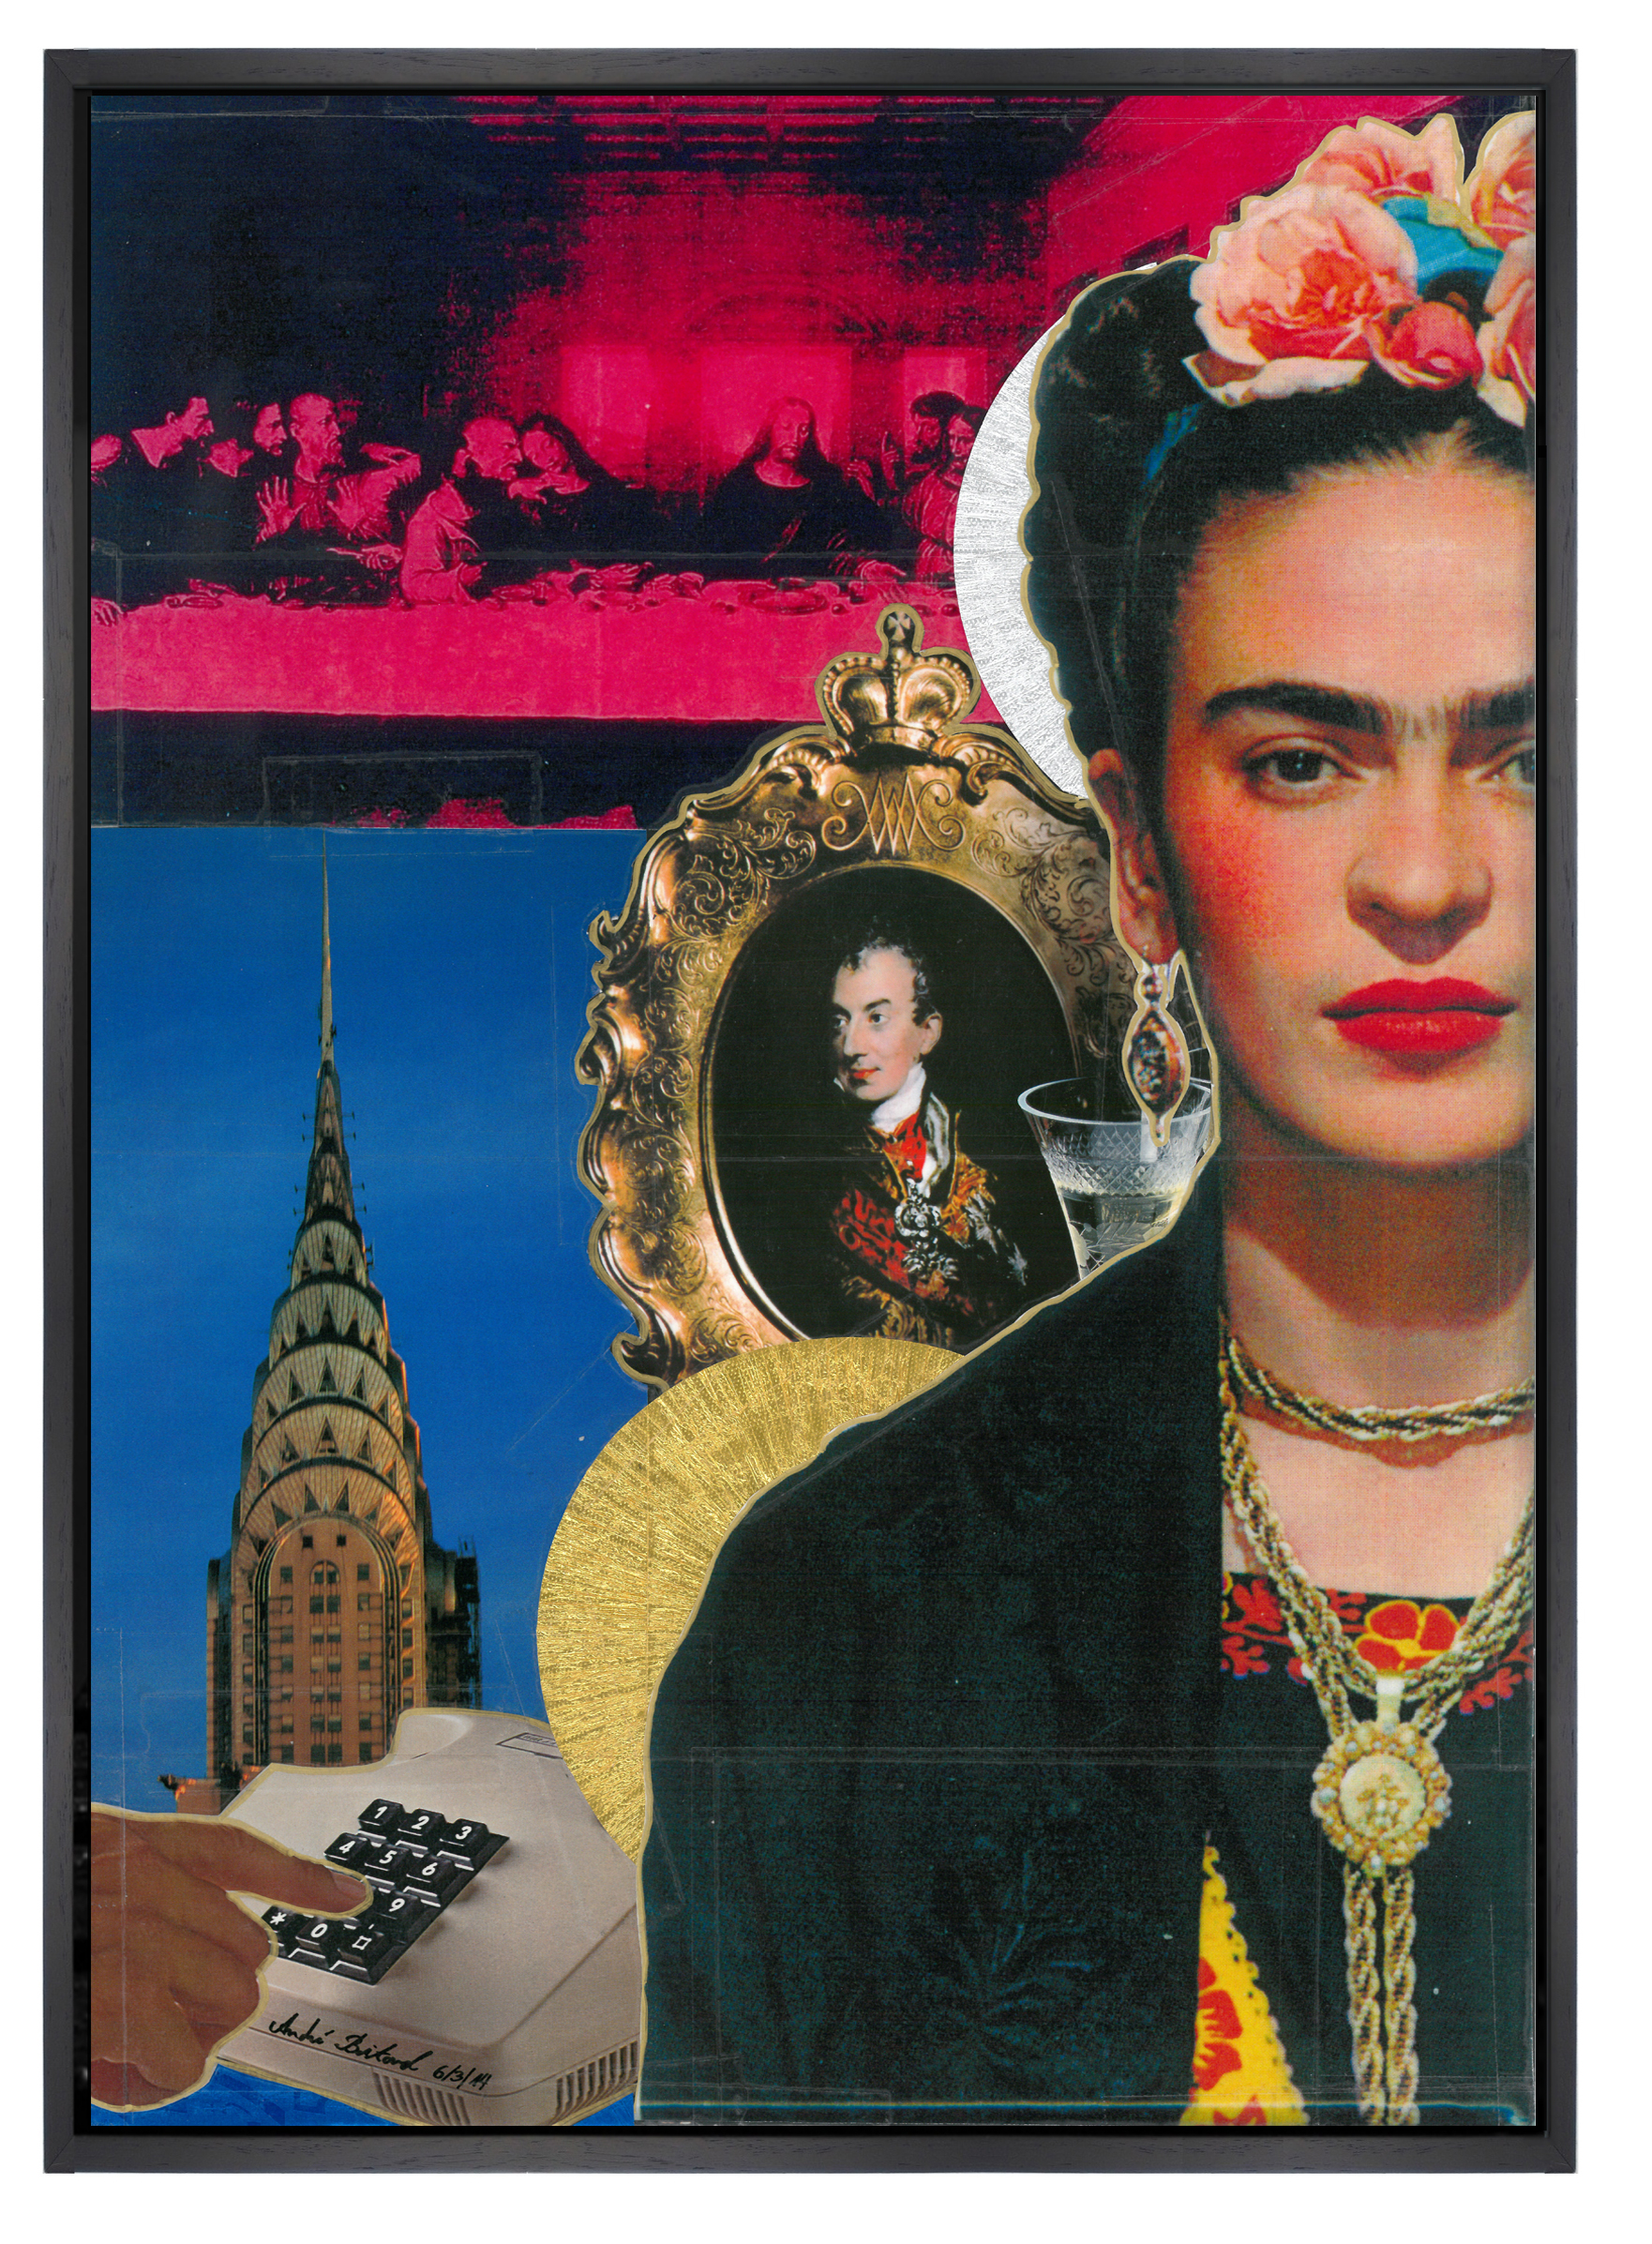 Andrè Boitard  Frida Kahlo 2014  Collage  Unique Piece  42cm x 30 cm